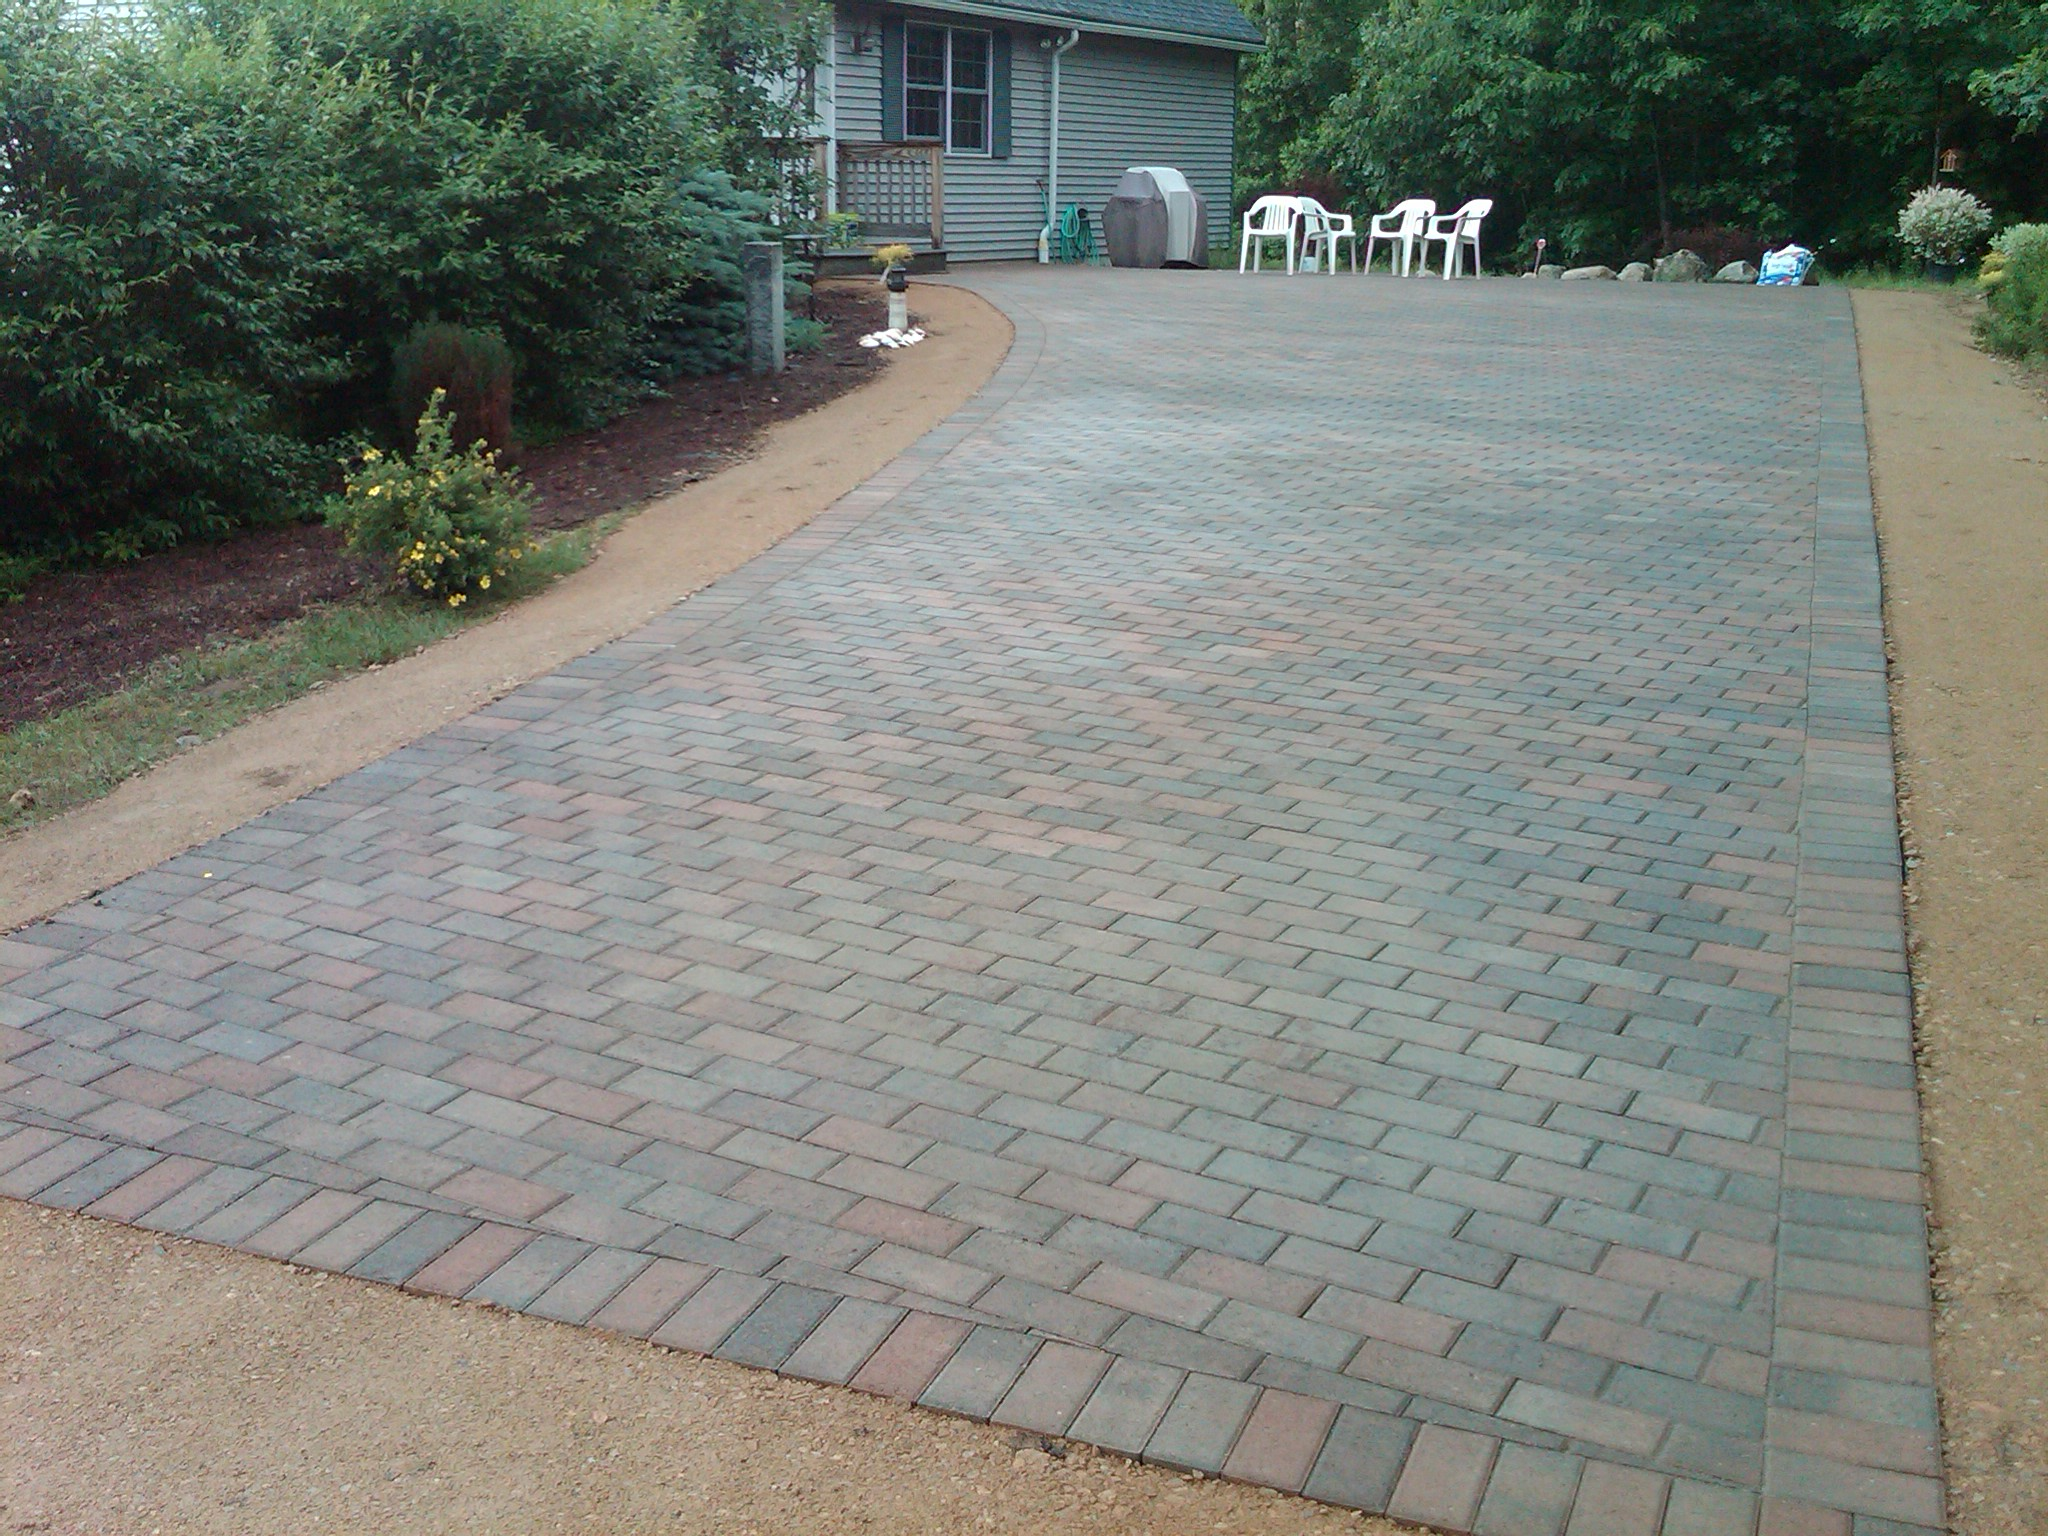 hardscapes-brick paver driveway installation-after